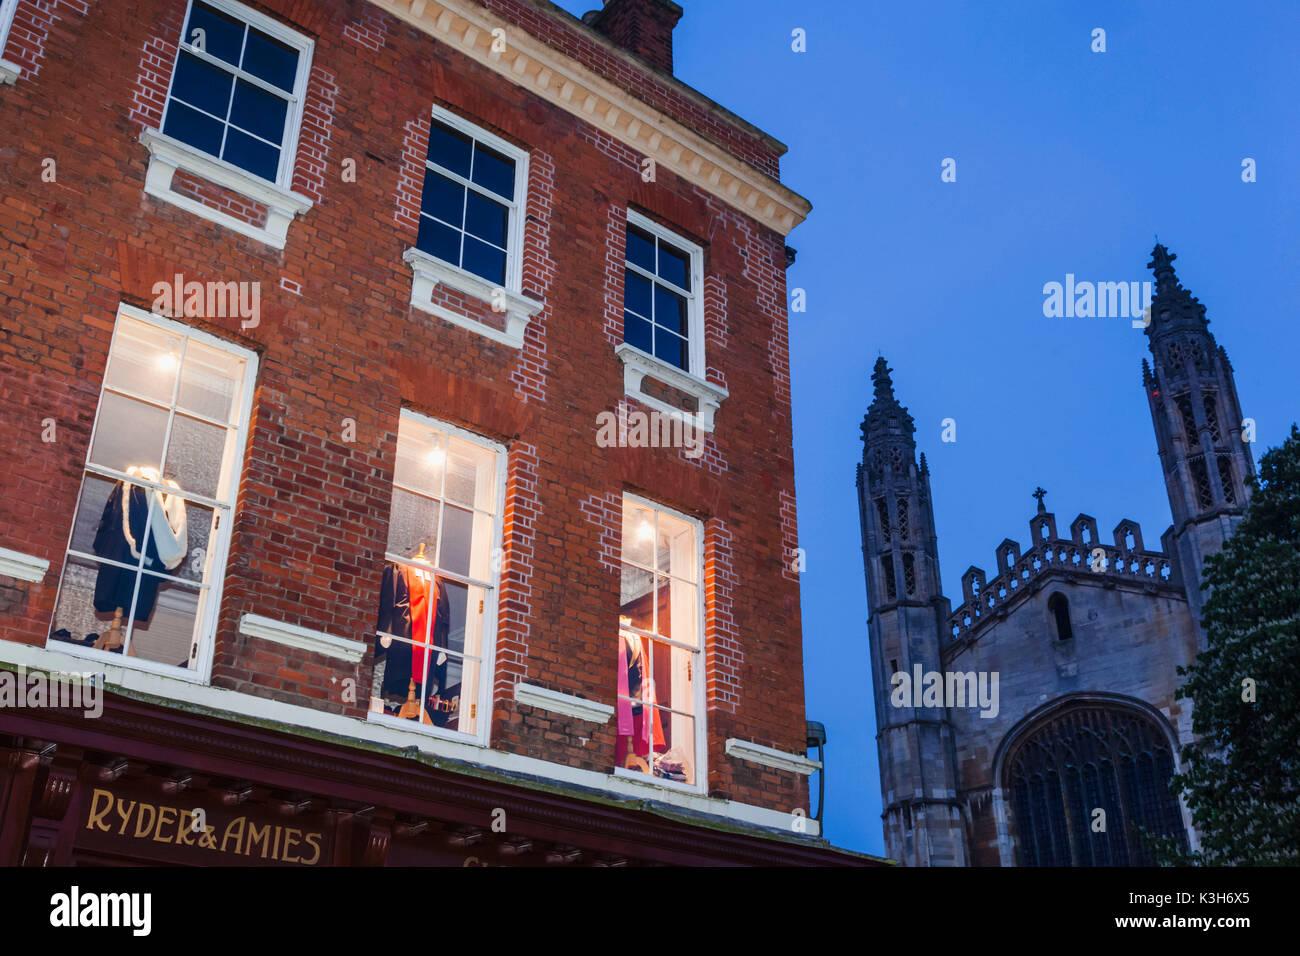 England, Cambridgeshire, Cambridge, Clothing Shop Window Display of Graduation Gowns - Stock Image